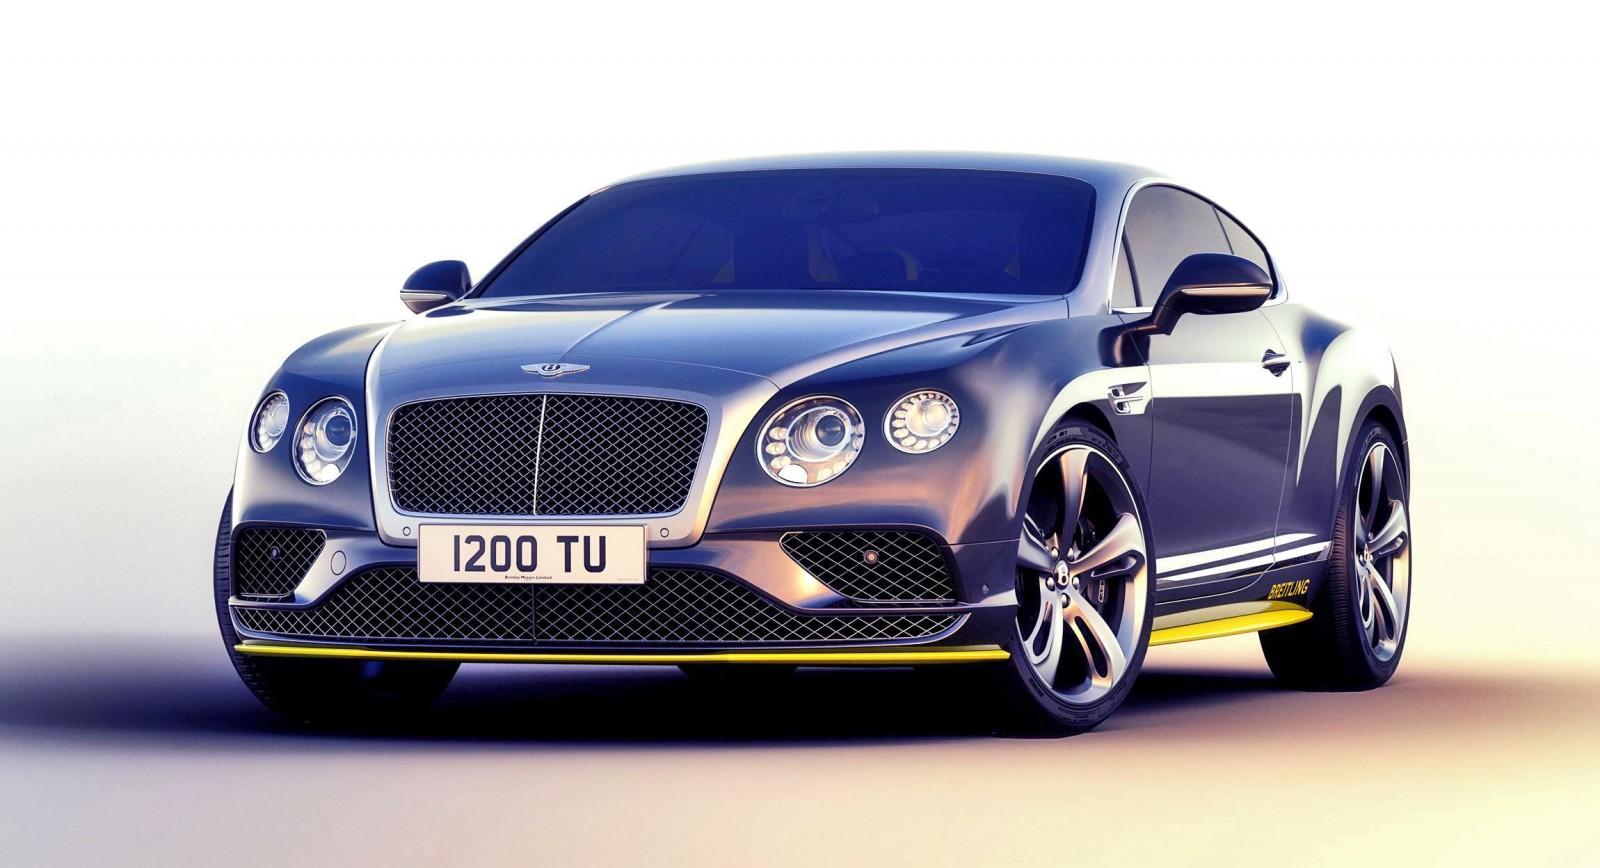 2016 Bentley Continental Gt Speed Breitling Jet Team